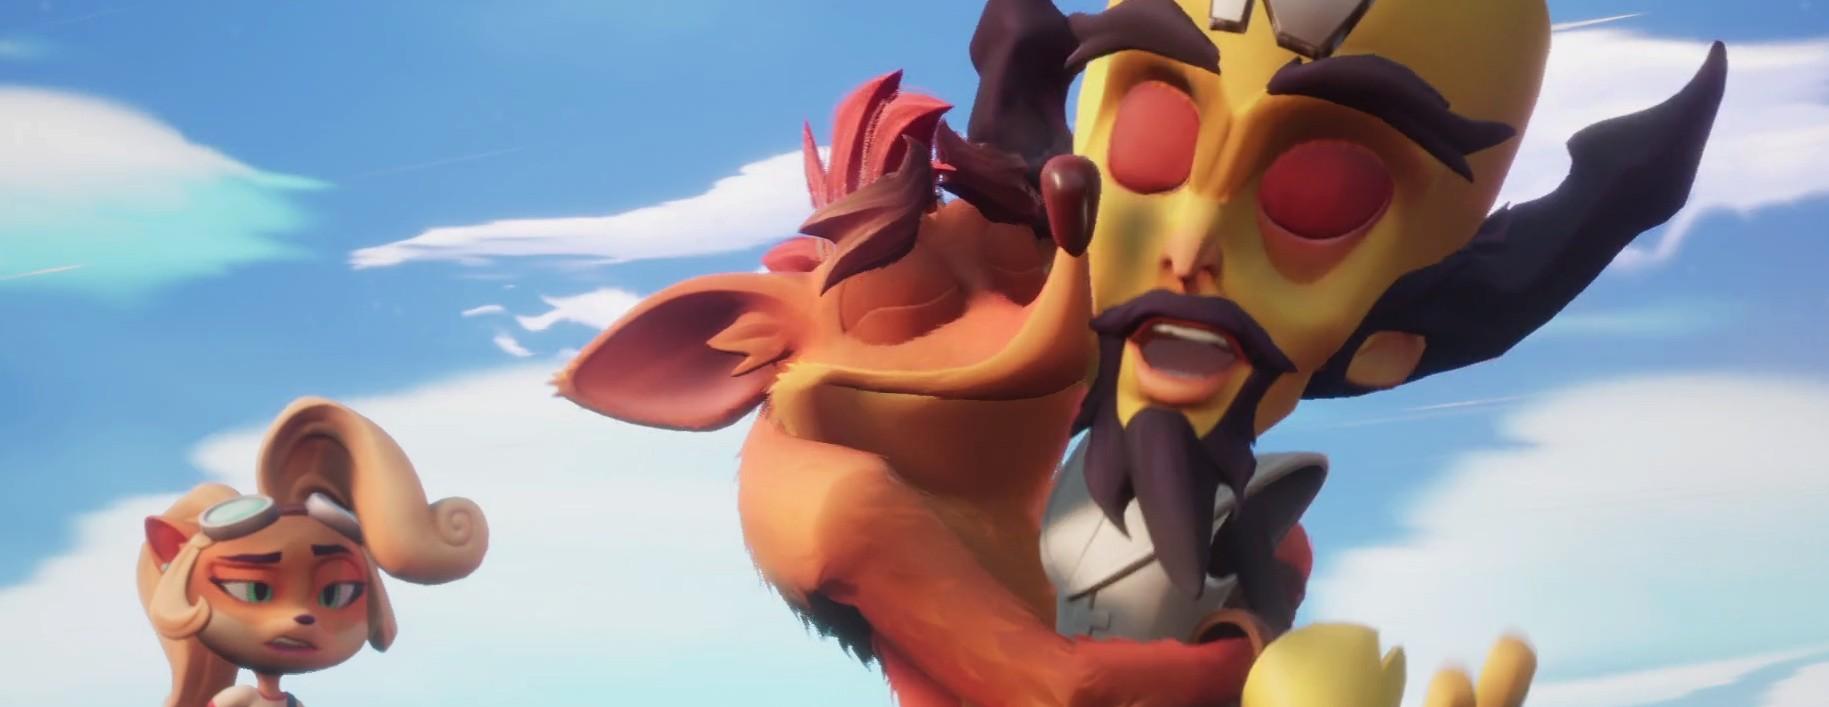 Crash Bandicoot 4 – Man in the Box